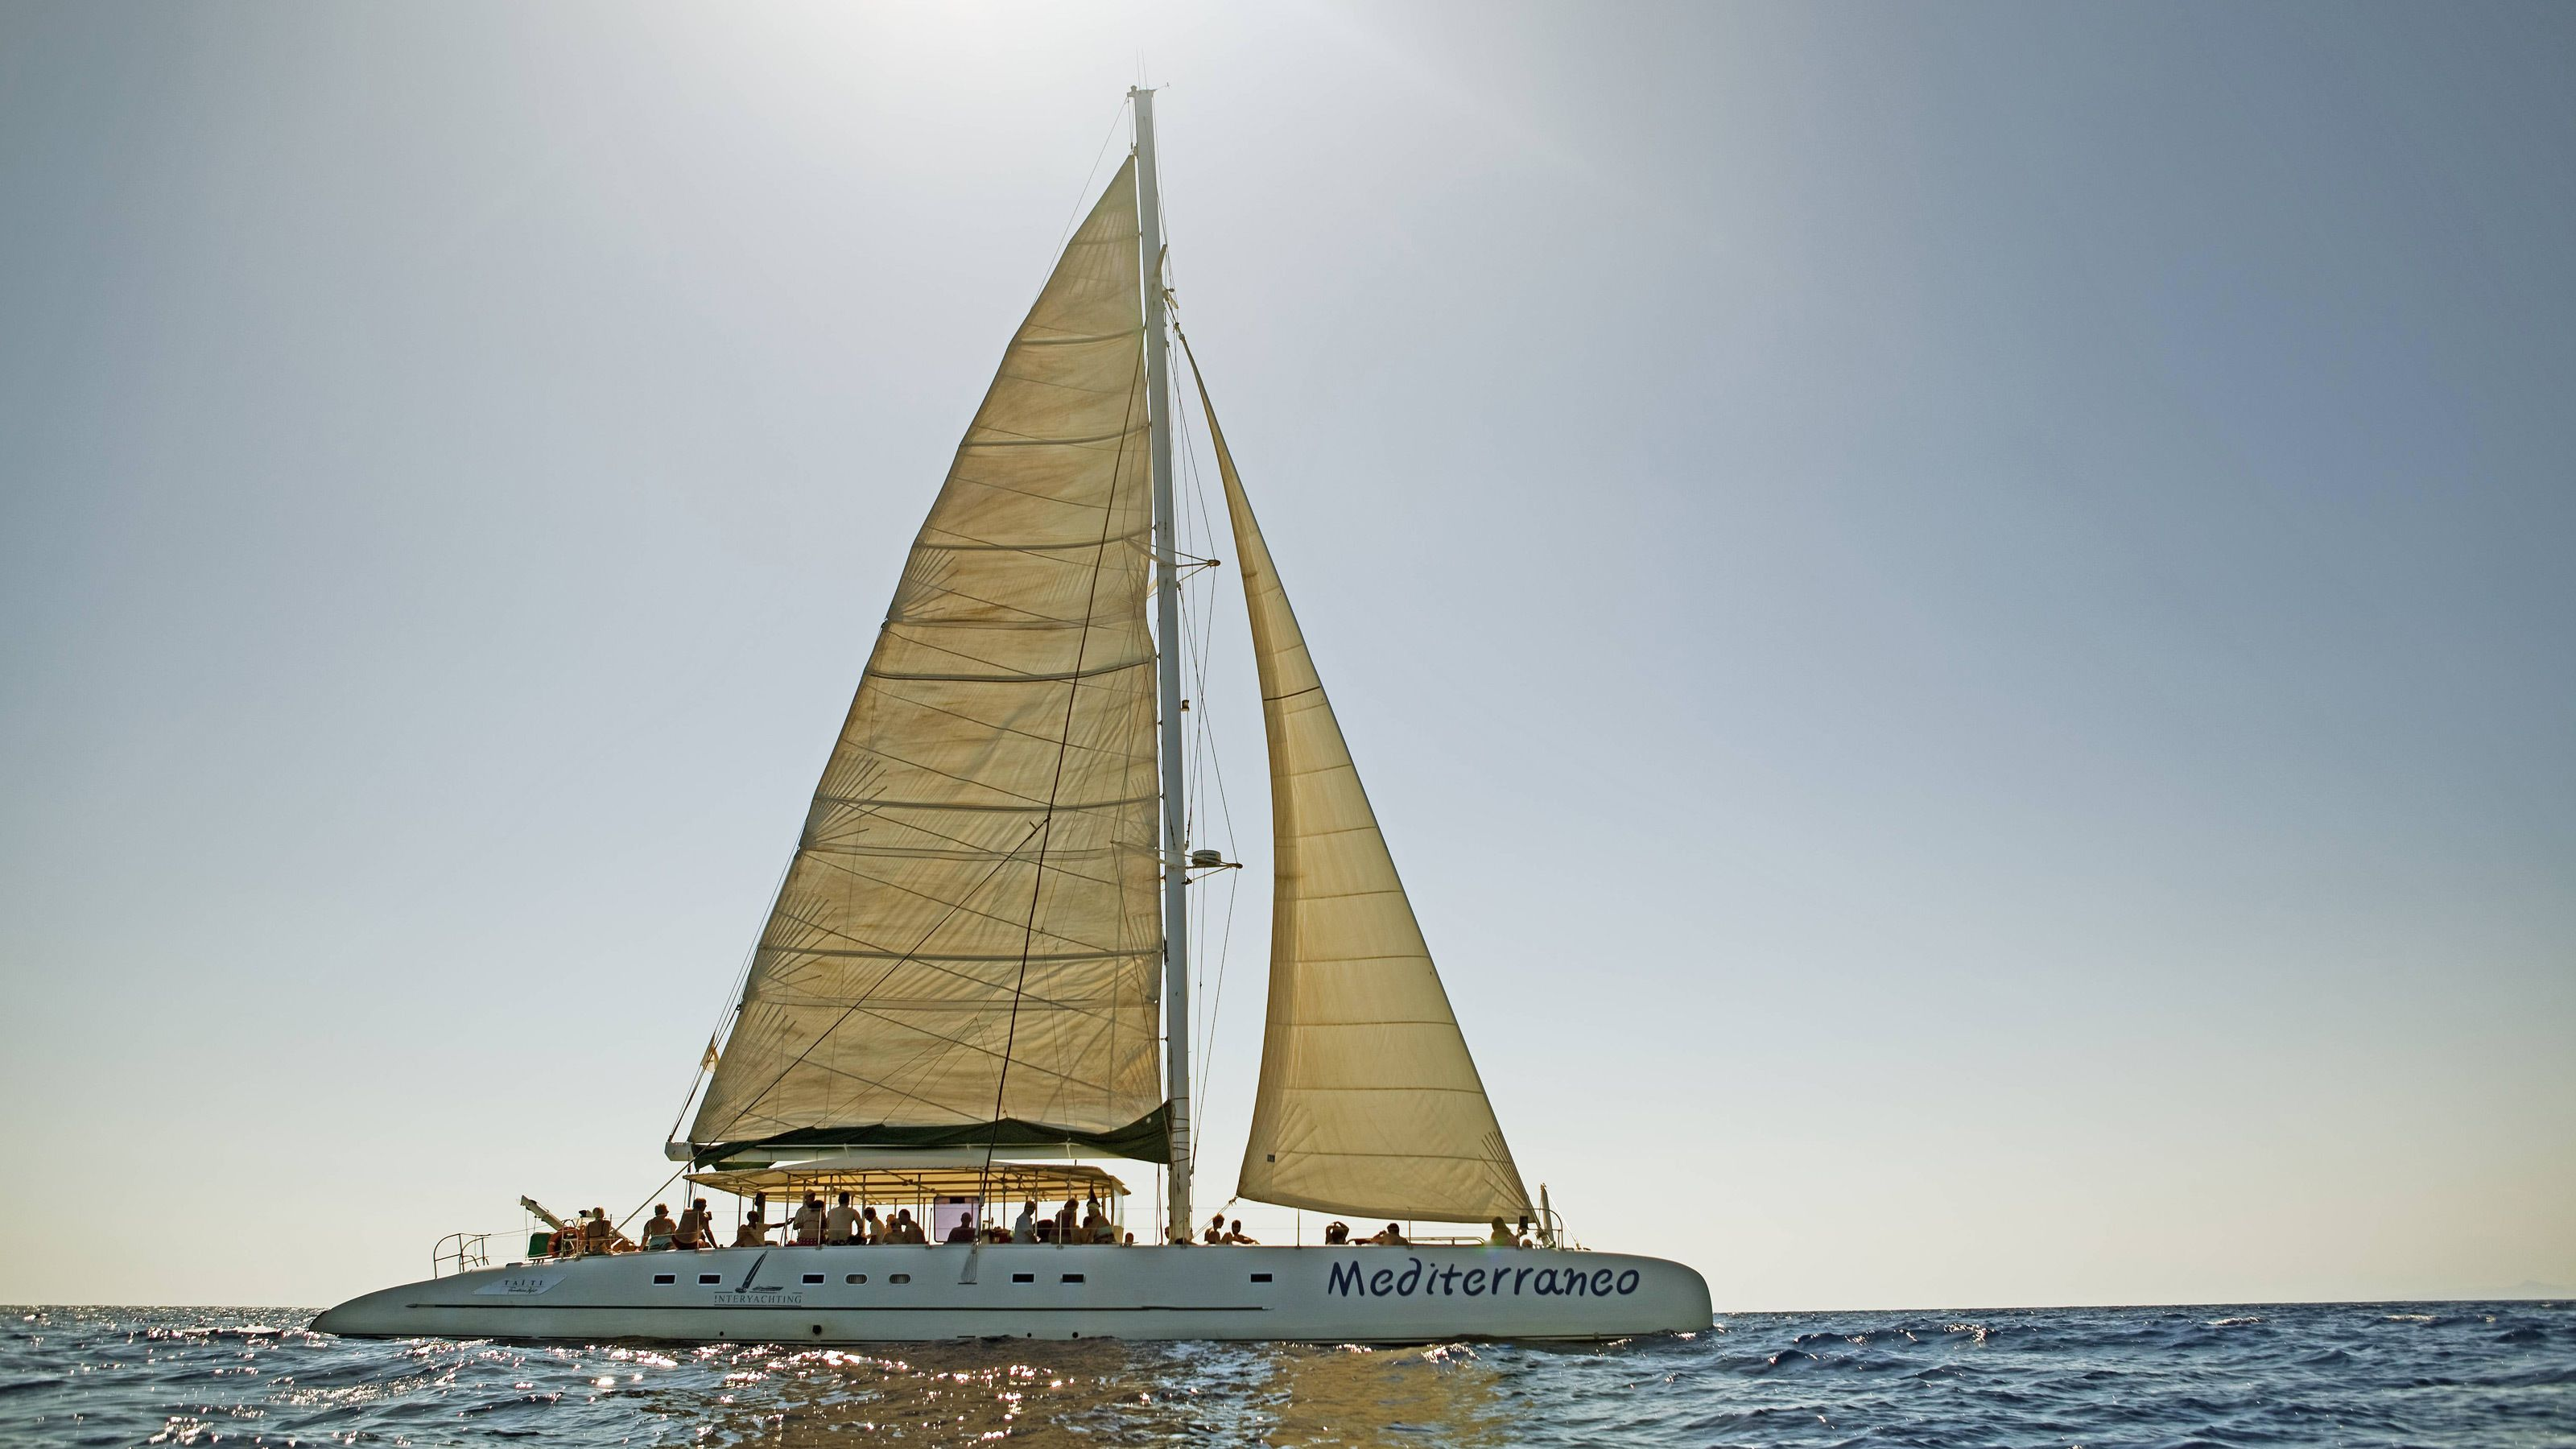 A Catamaran with its sail illuminated by the sun